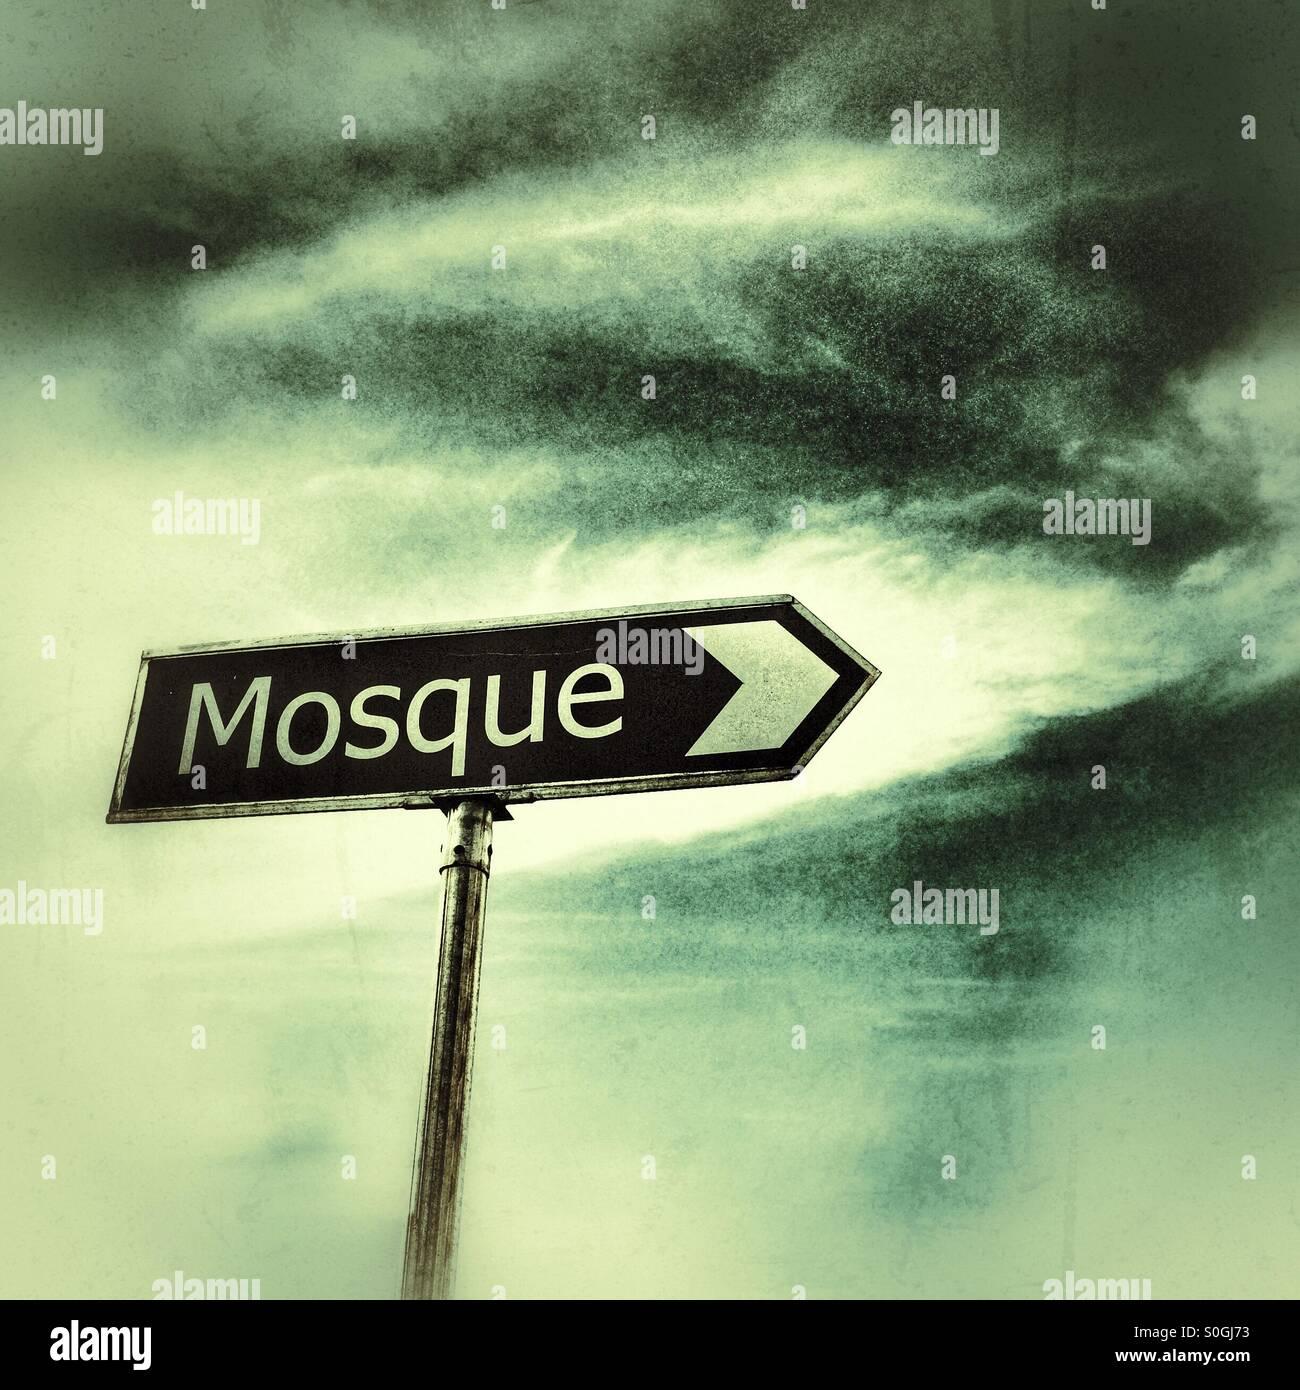 Signo de la mezquita. Imagen De Stock